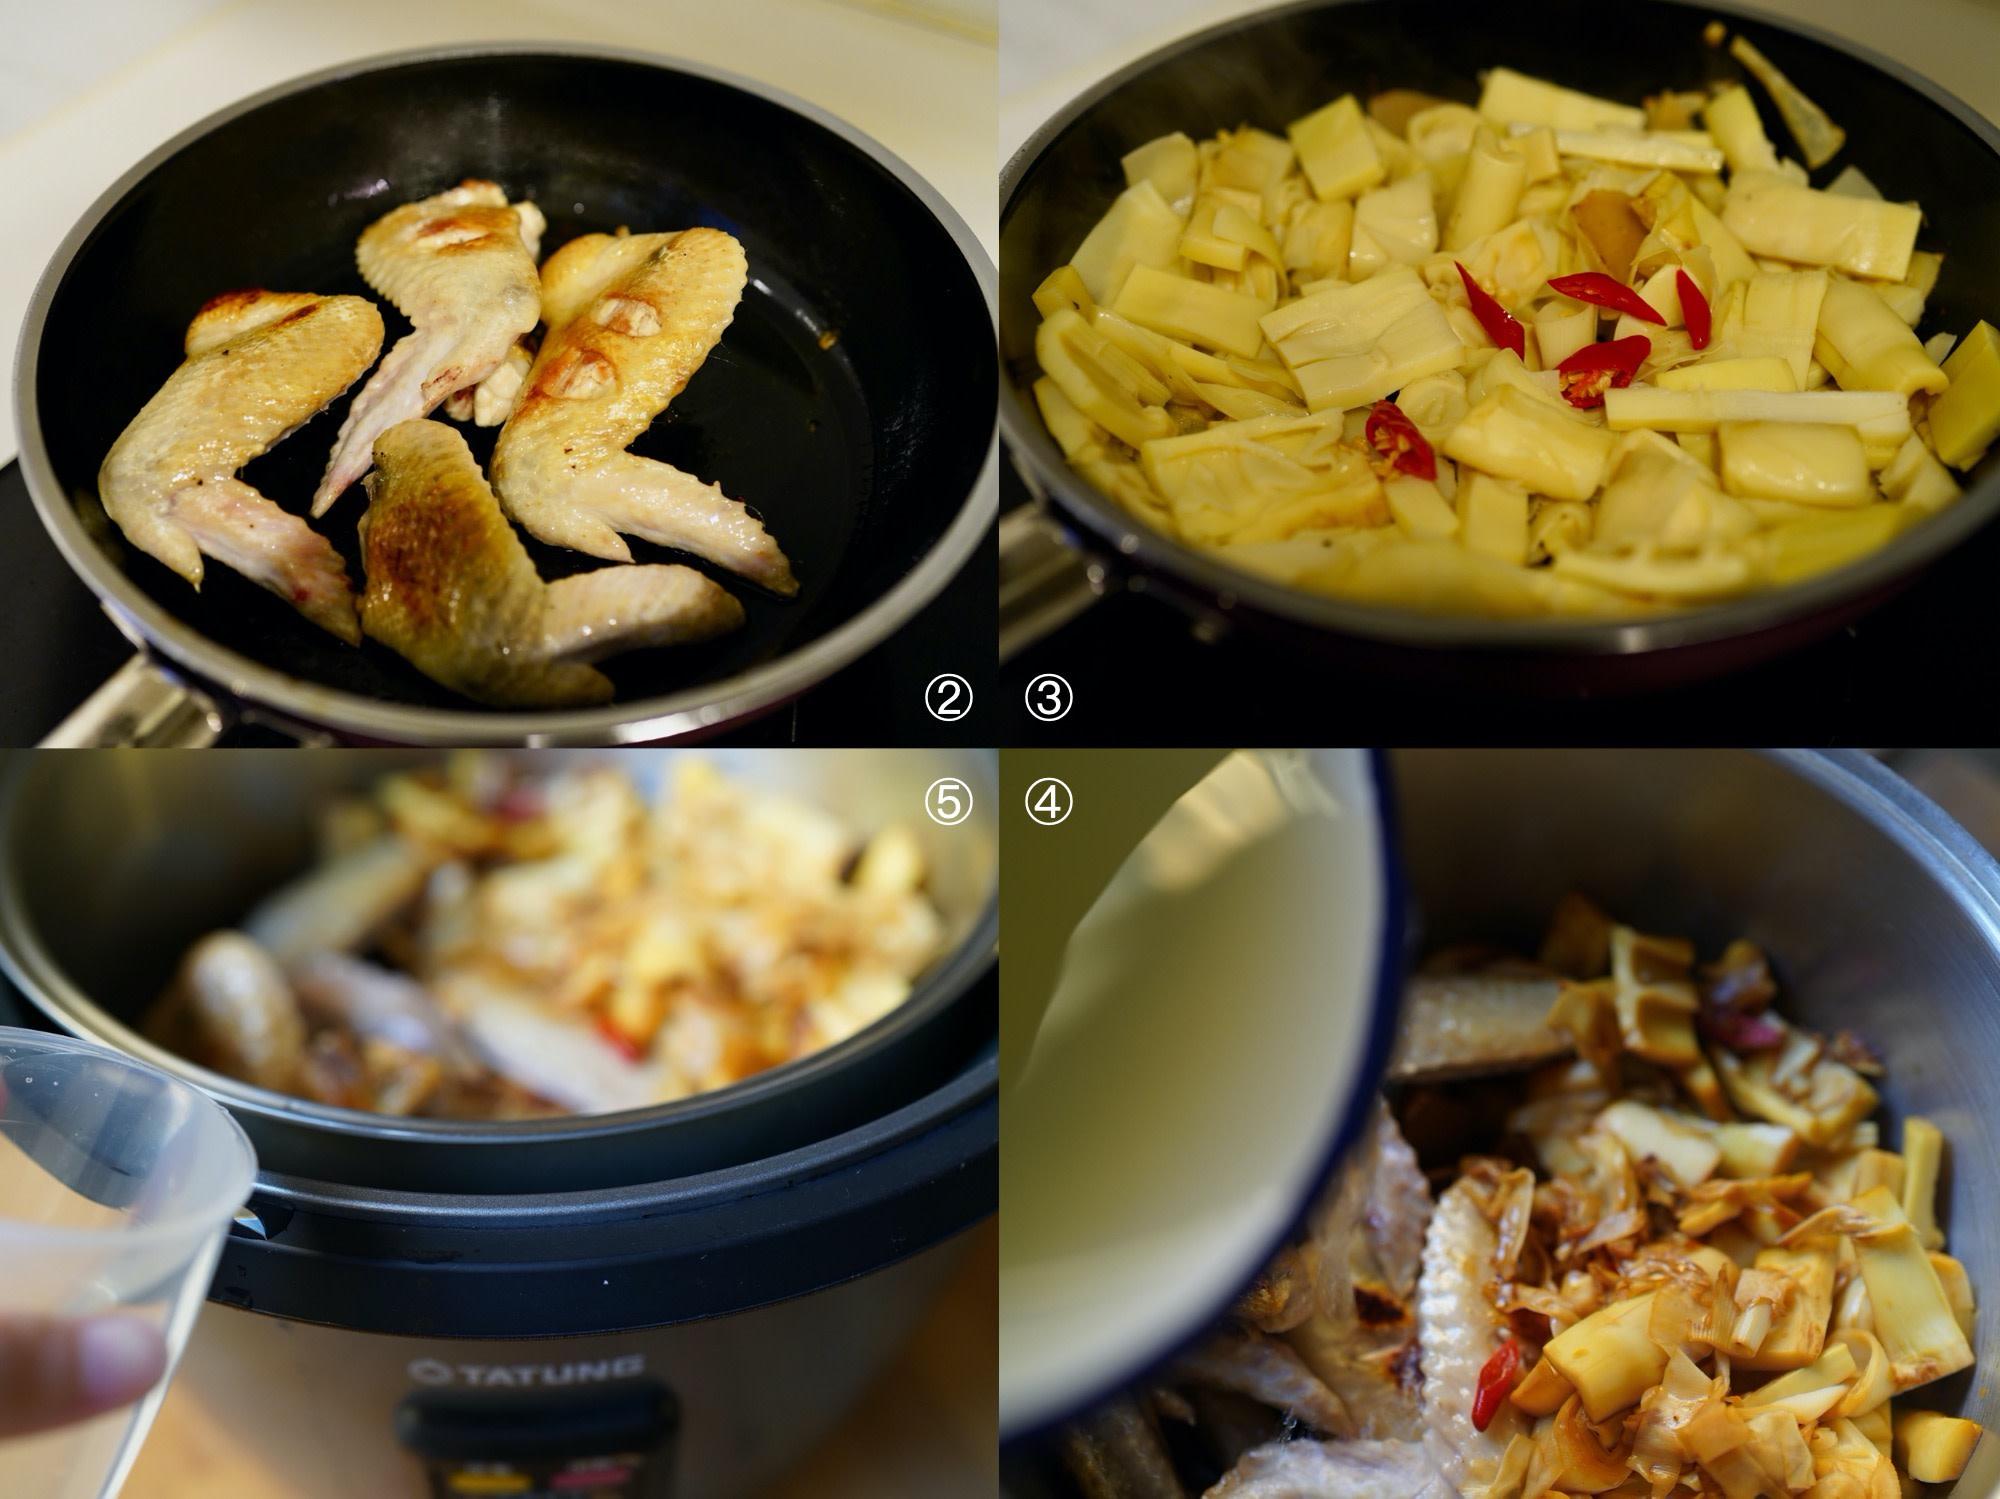 bamboo-shoot-chicken-wing_Fotor